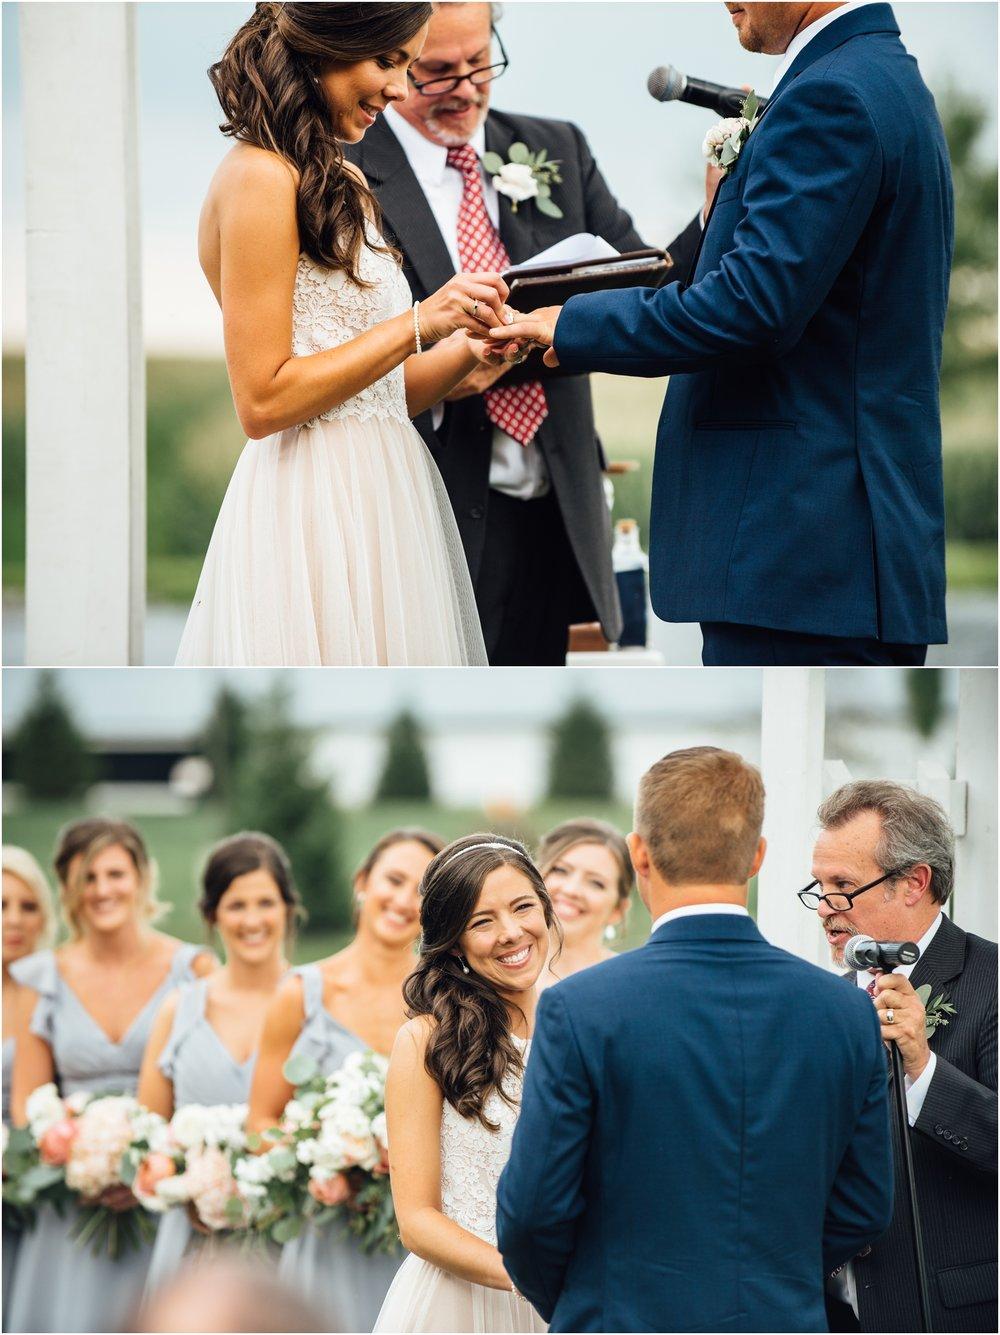 Steph&Bryan_Lancaster_wedding_farm_0513.jpg